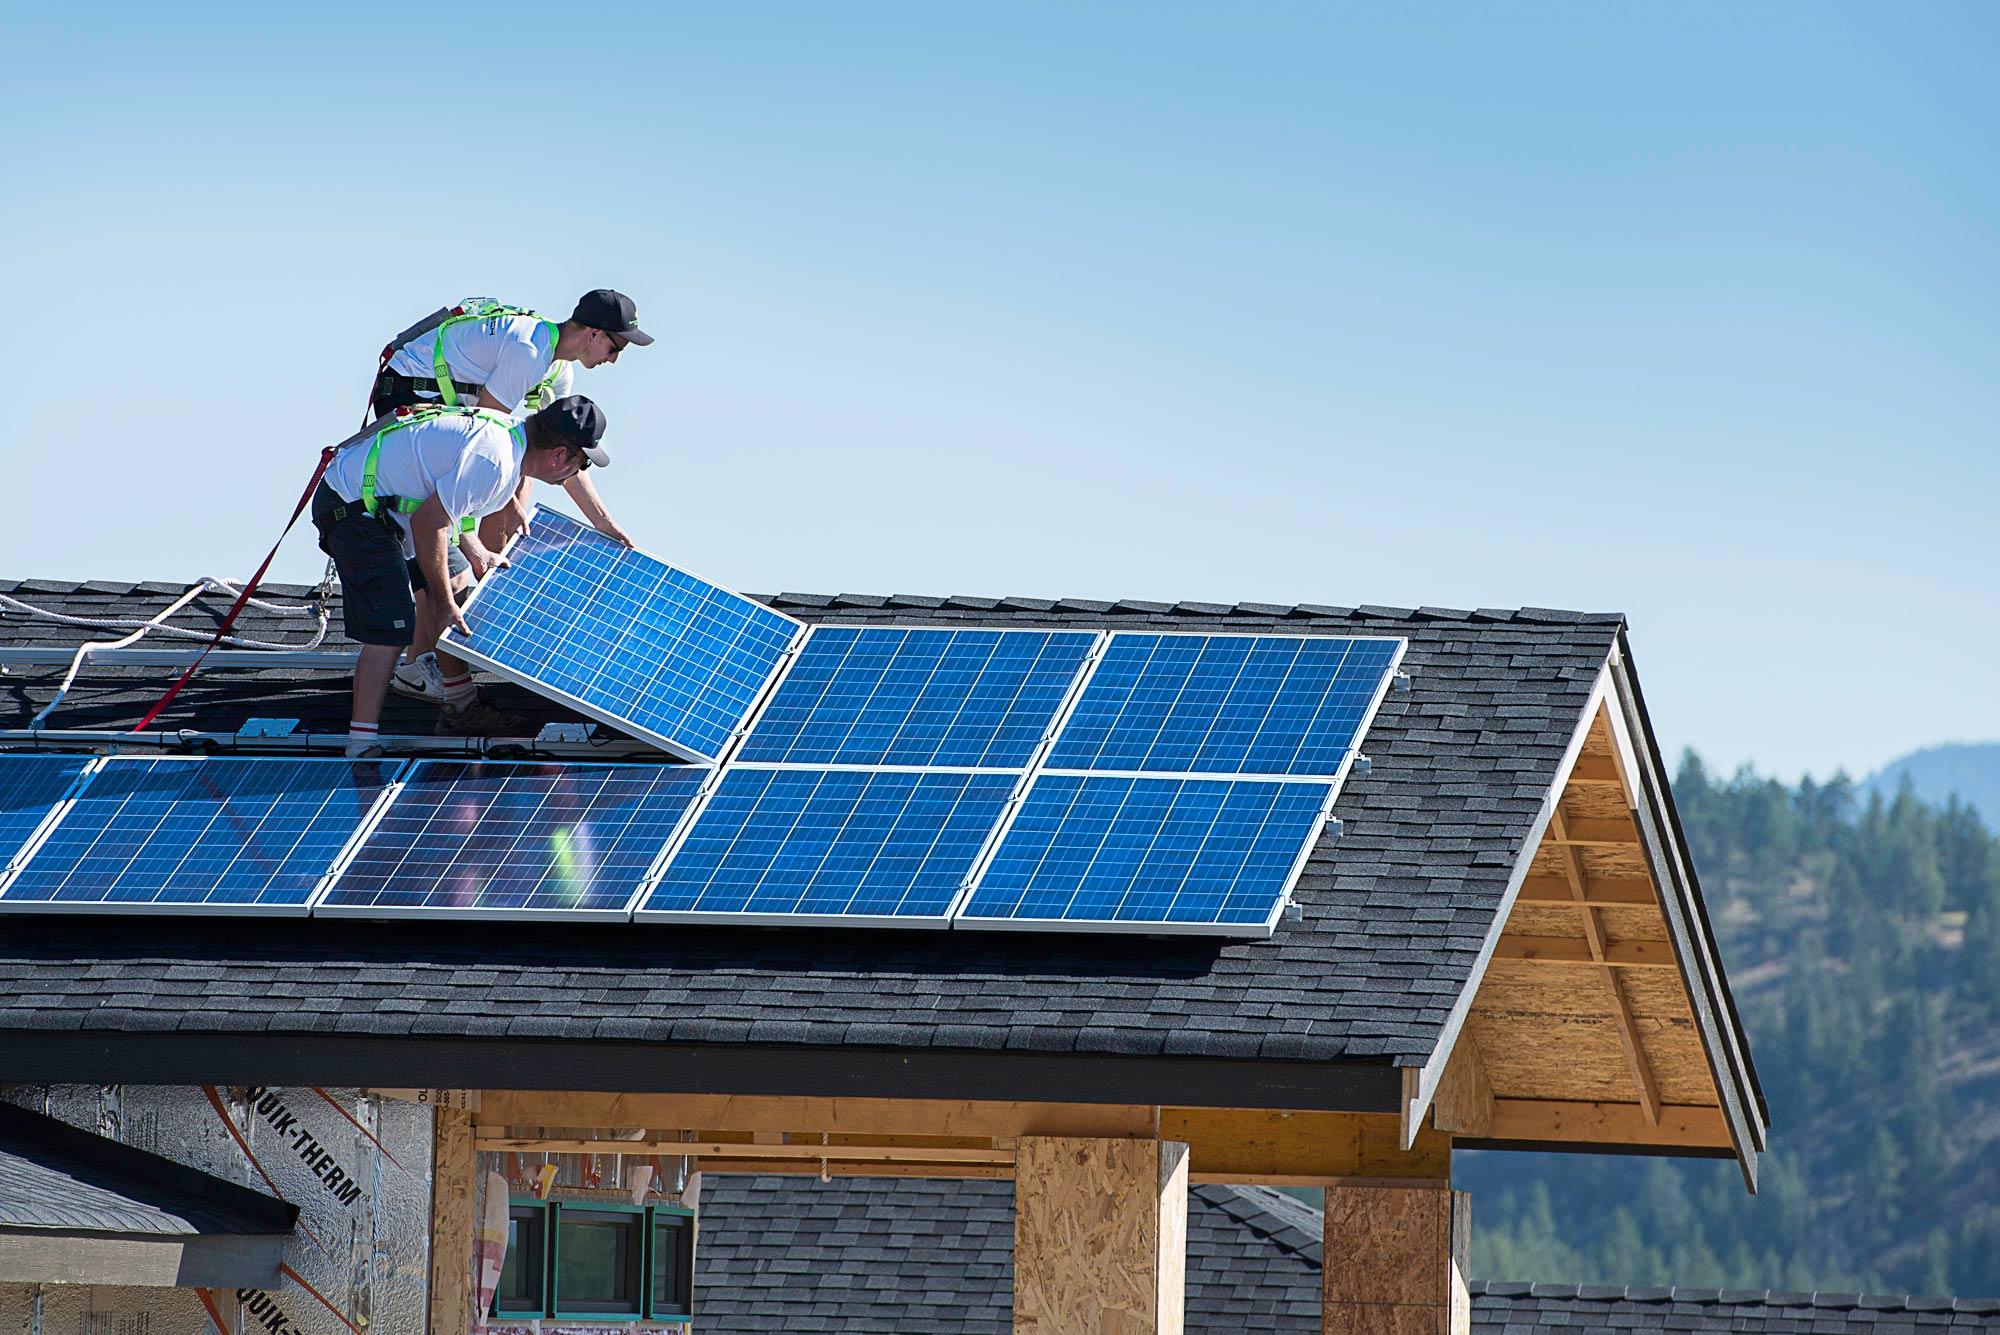 Solar panel installation image